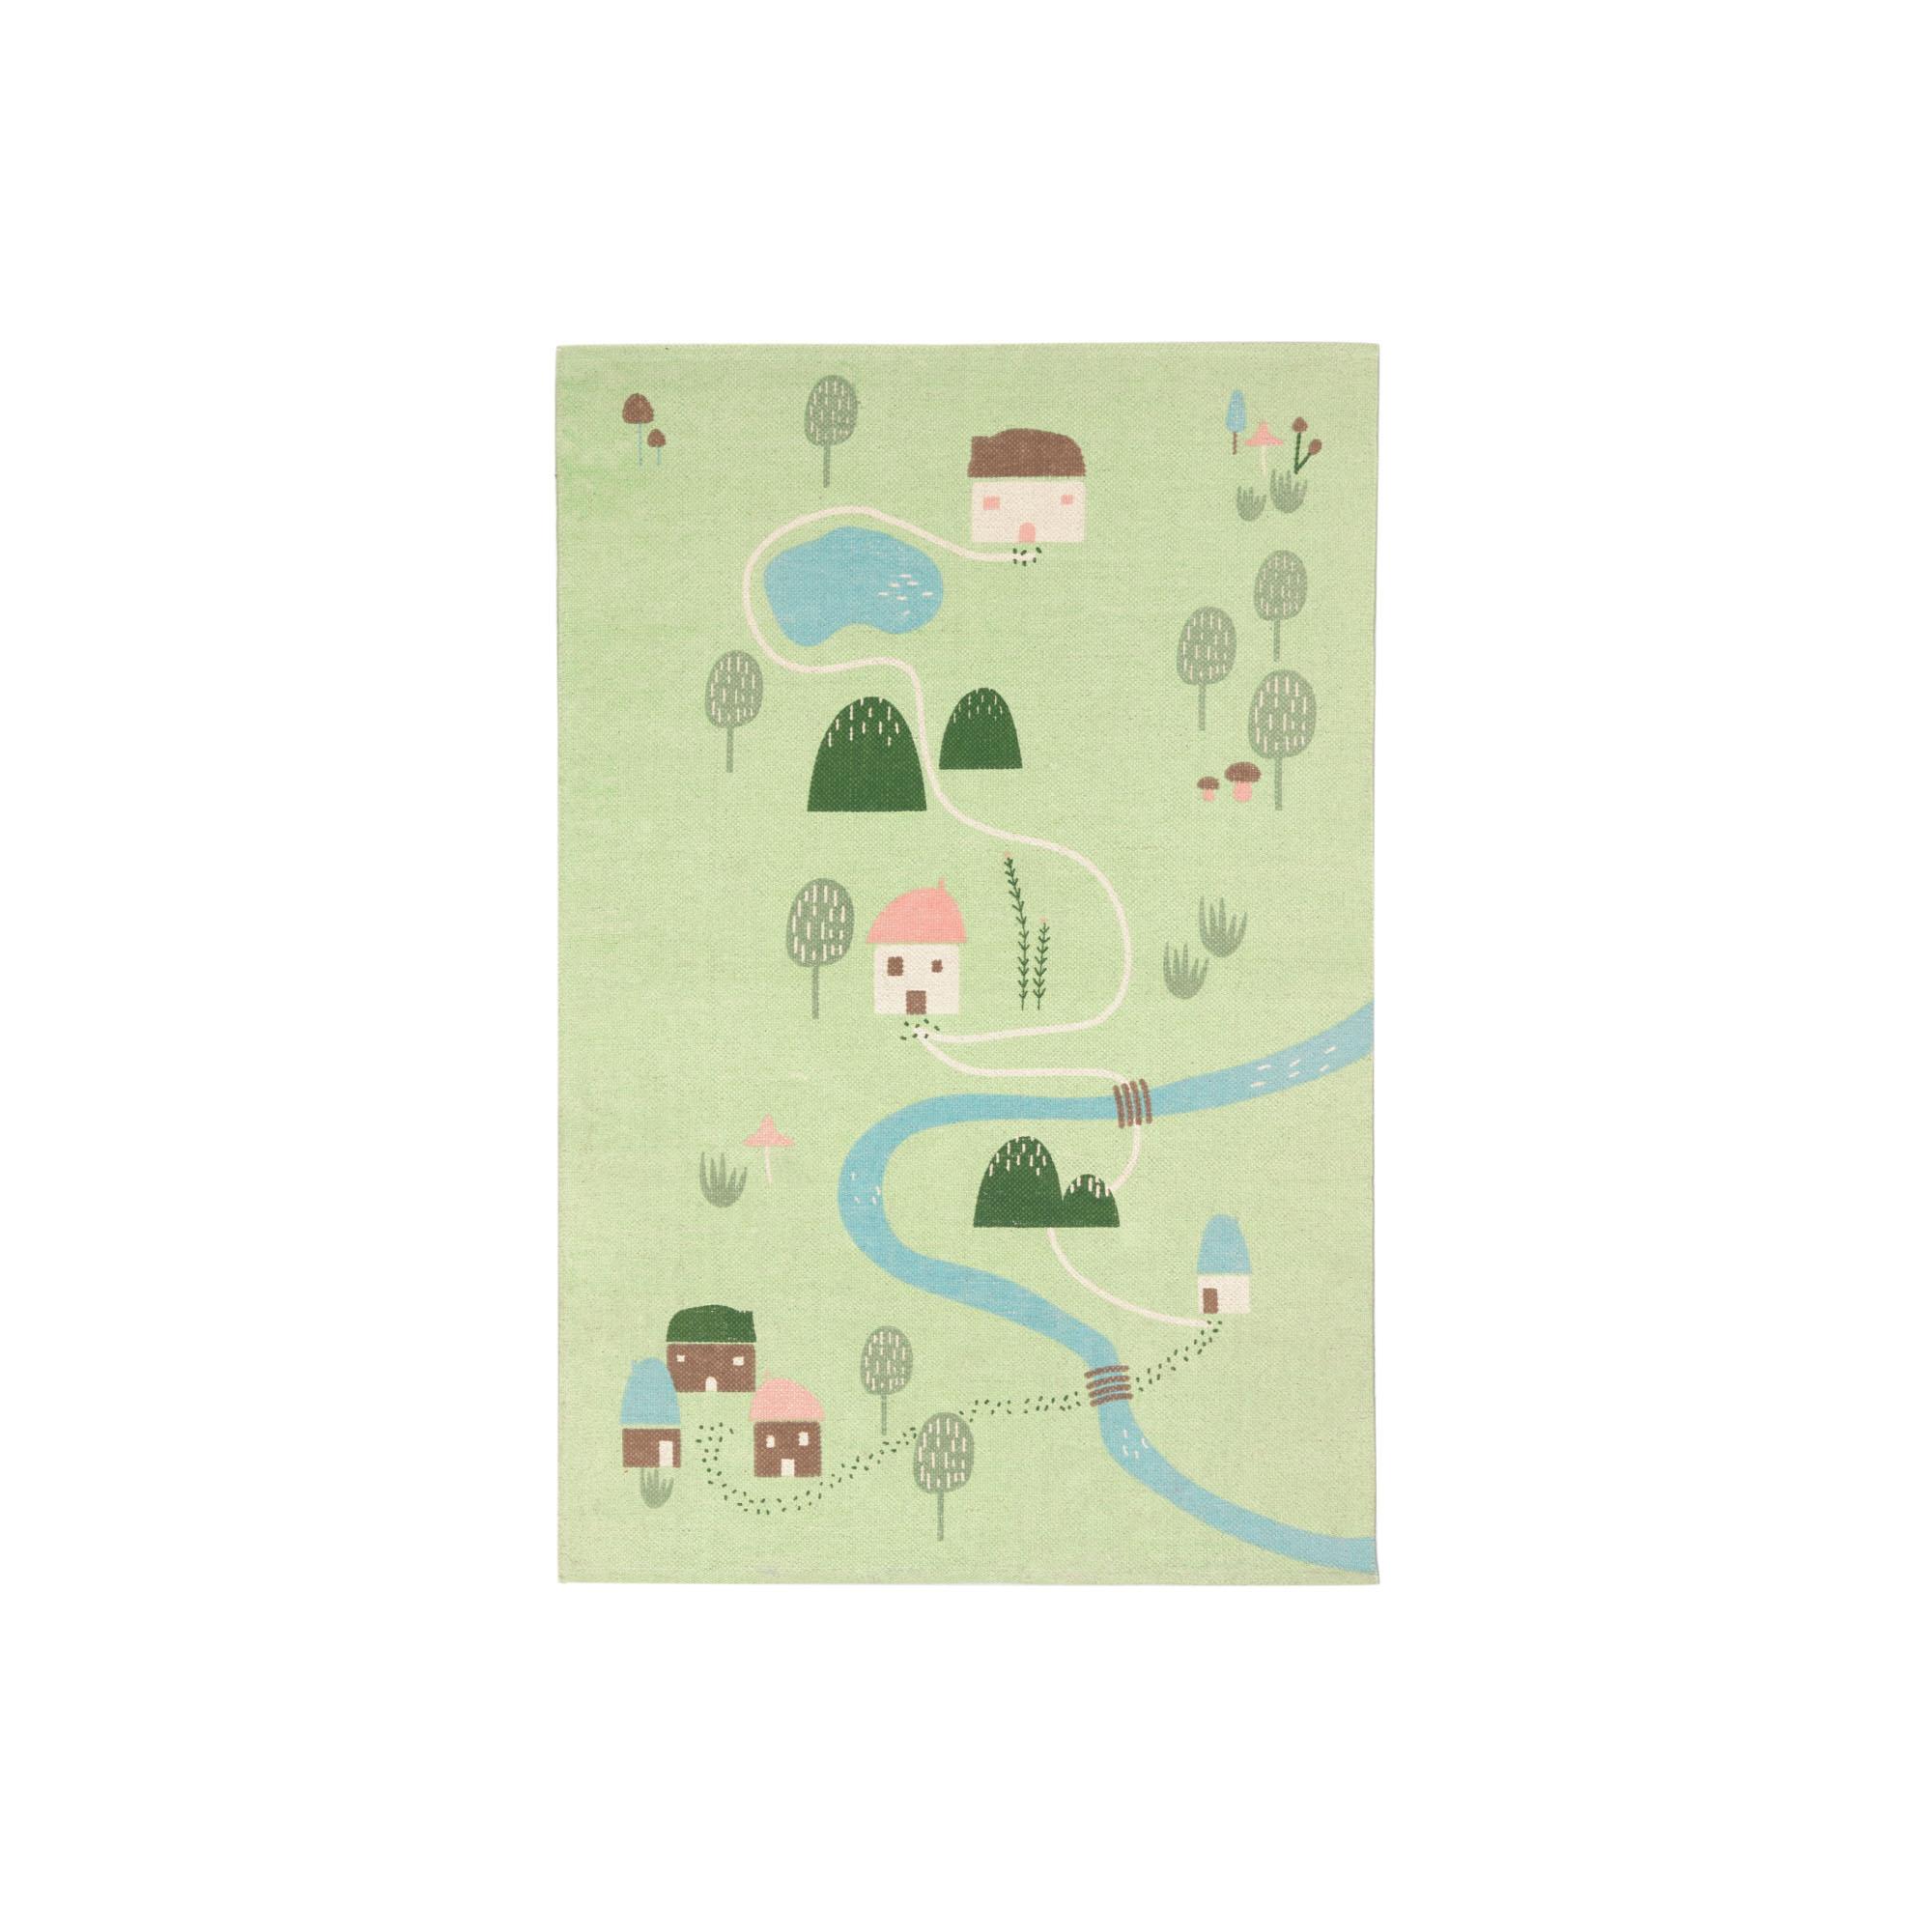 Kave home - tapis llaru 100% coton vert maisons...